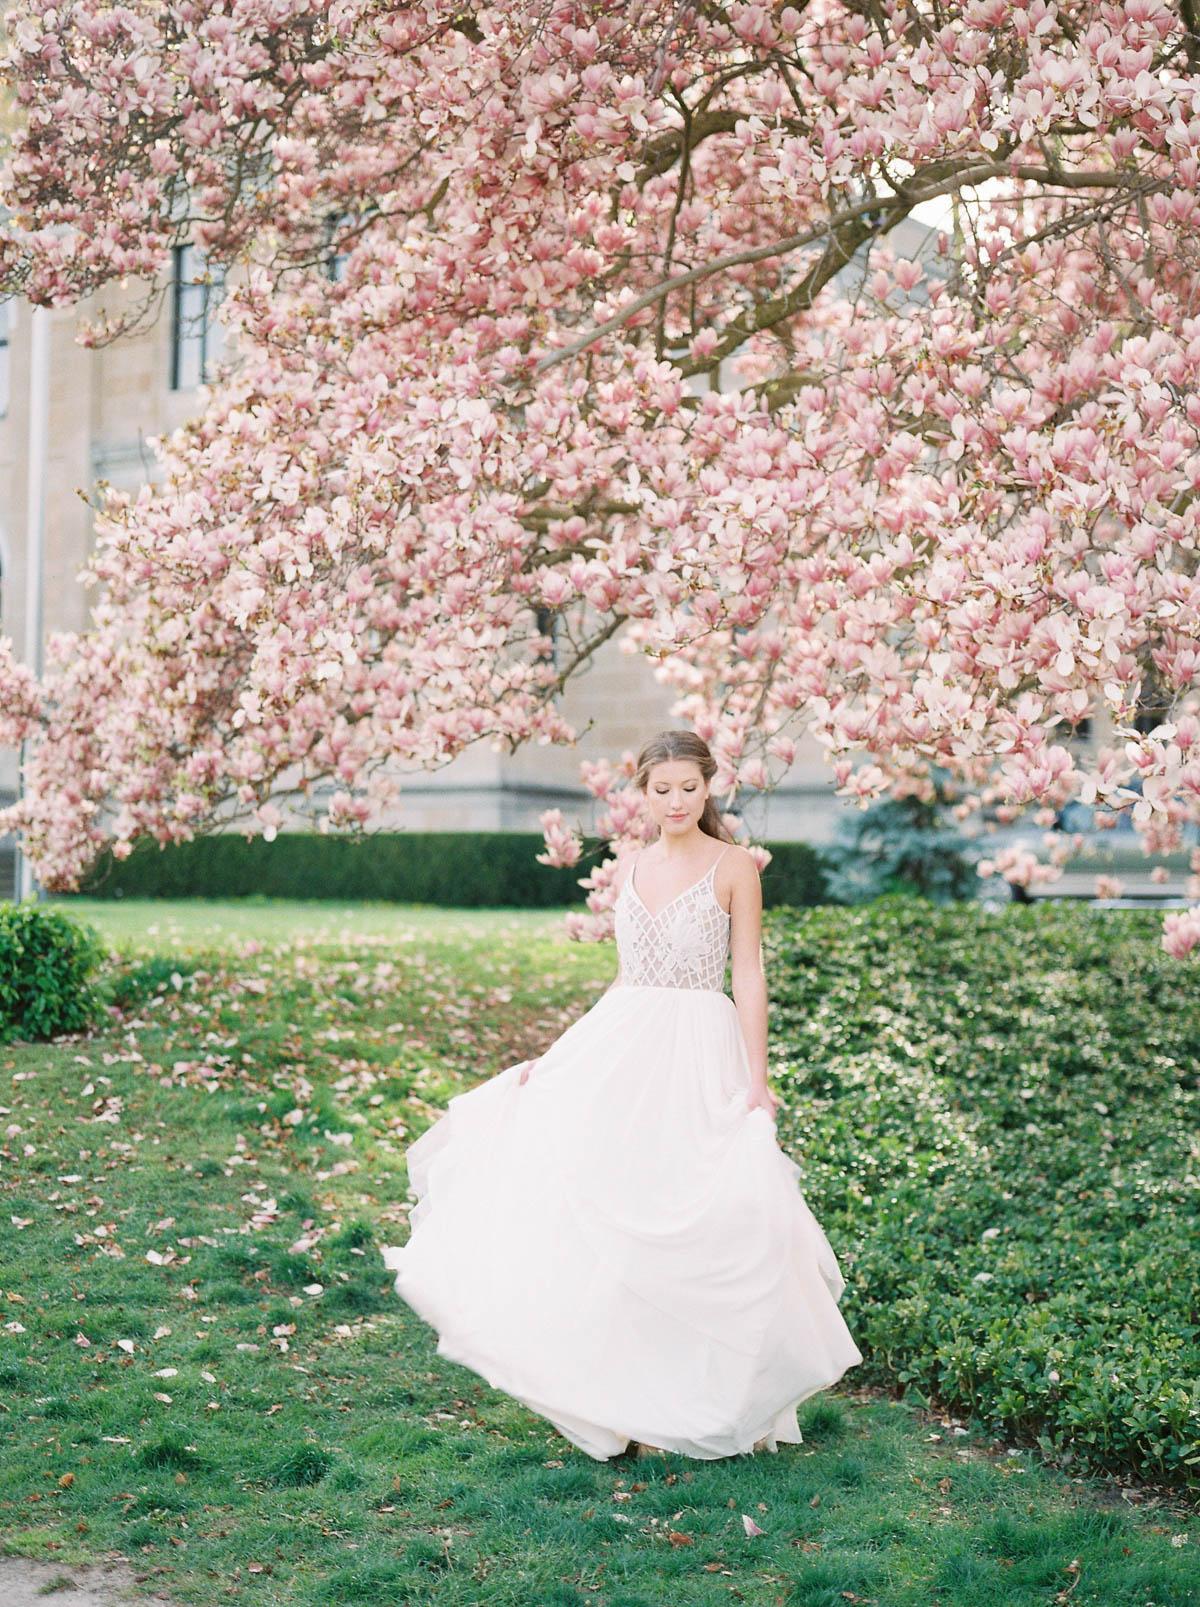 julia-park-photography-vineyard-bride-swish-list-niagara-on-the-lake-wedding-editorial-9.jpg